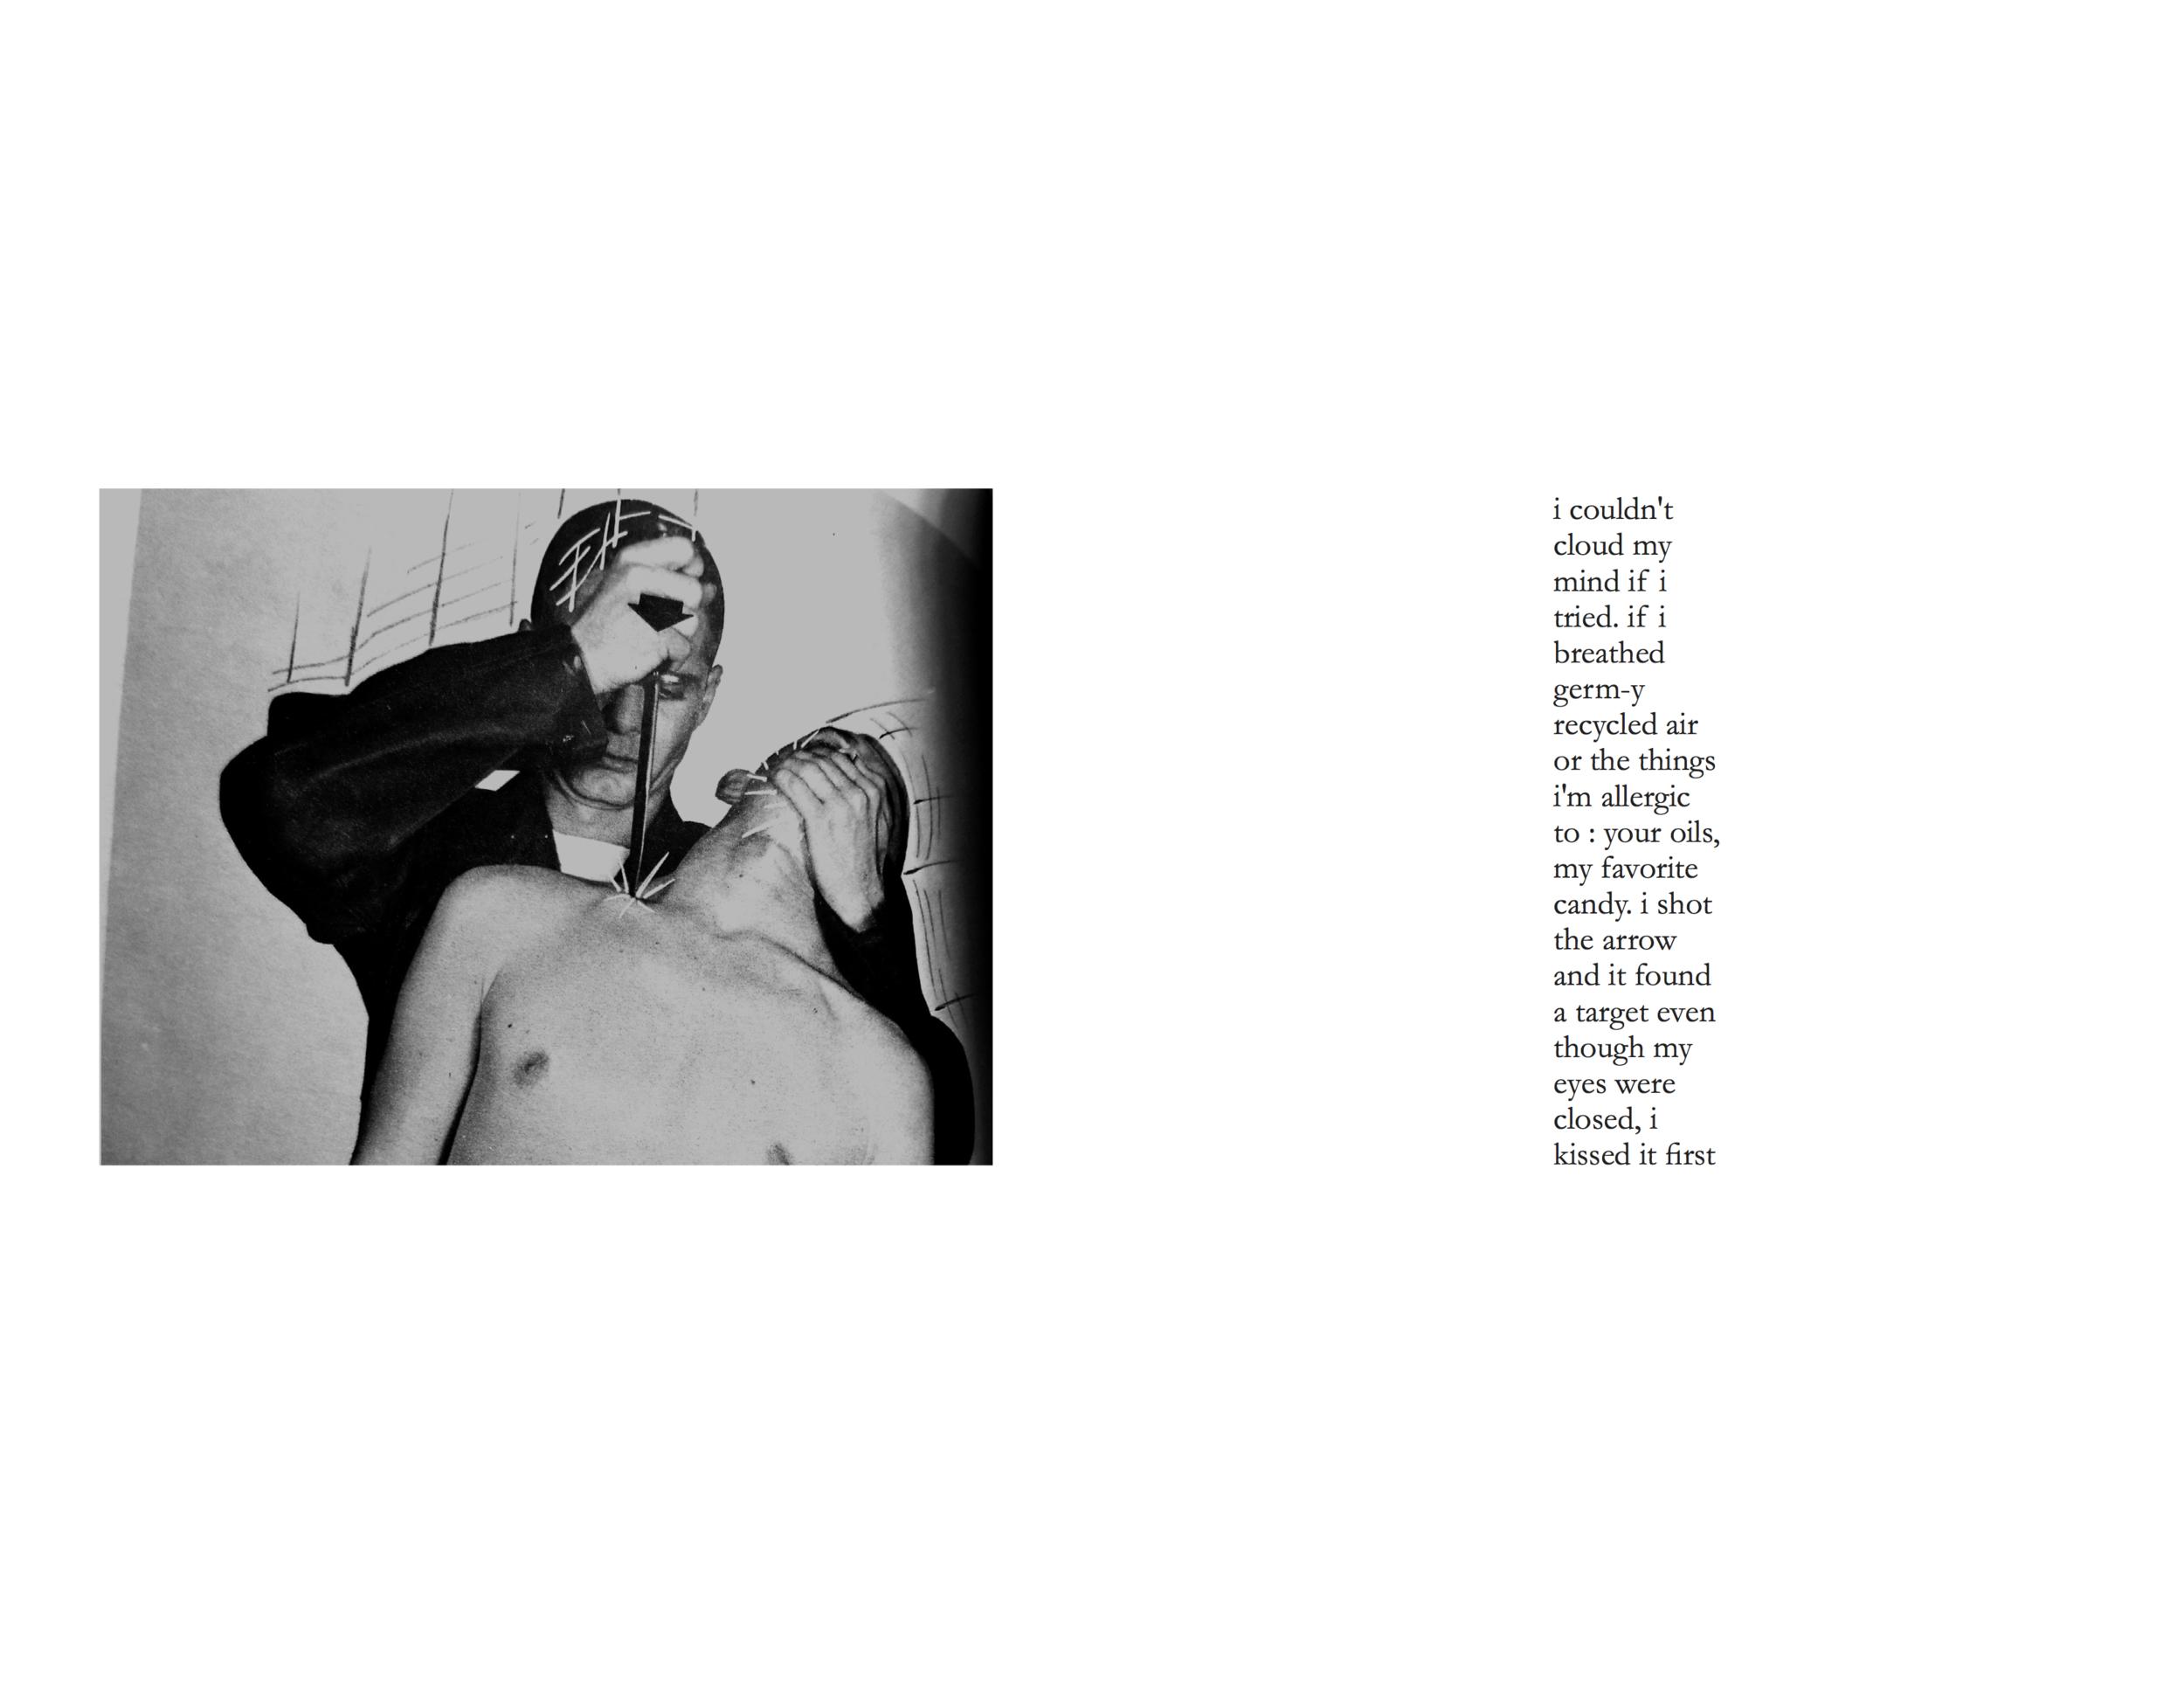 pg. 8 of (- - -)